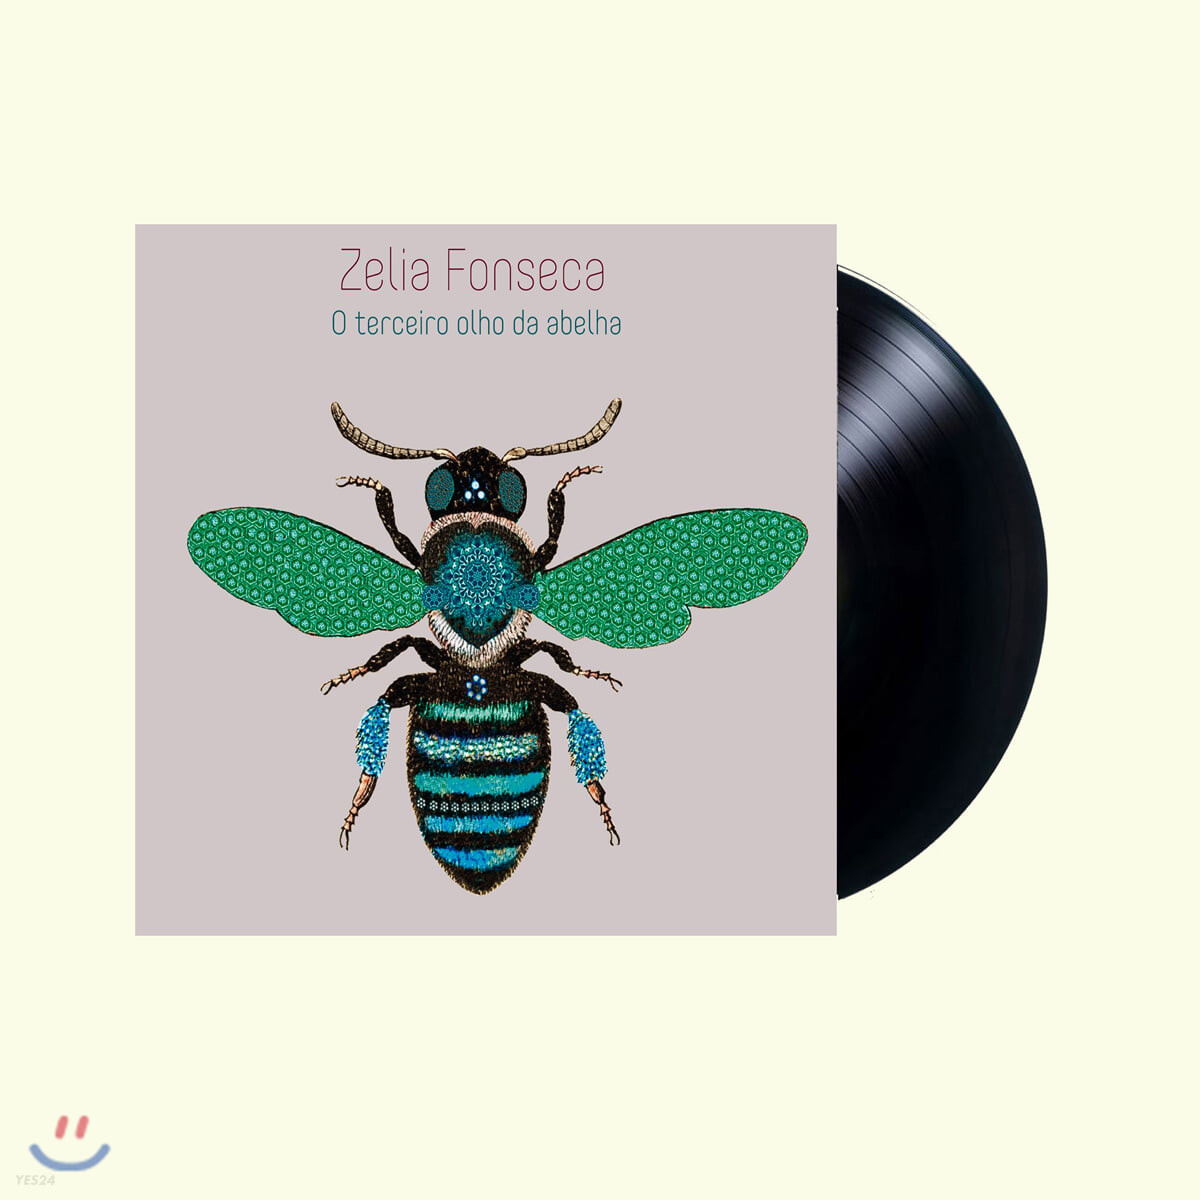 Zelia Fonseca (젤리아 폰세카) -  O Terceiro Olho da Abelha [LP]